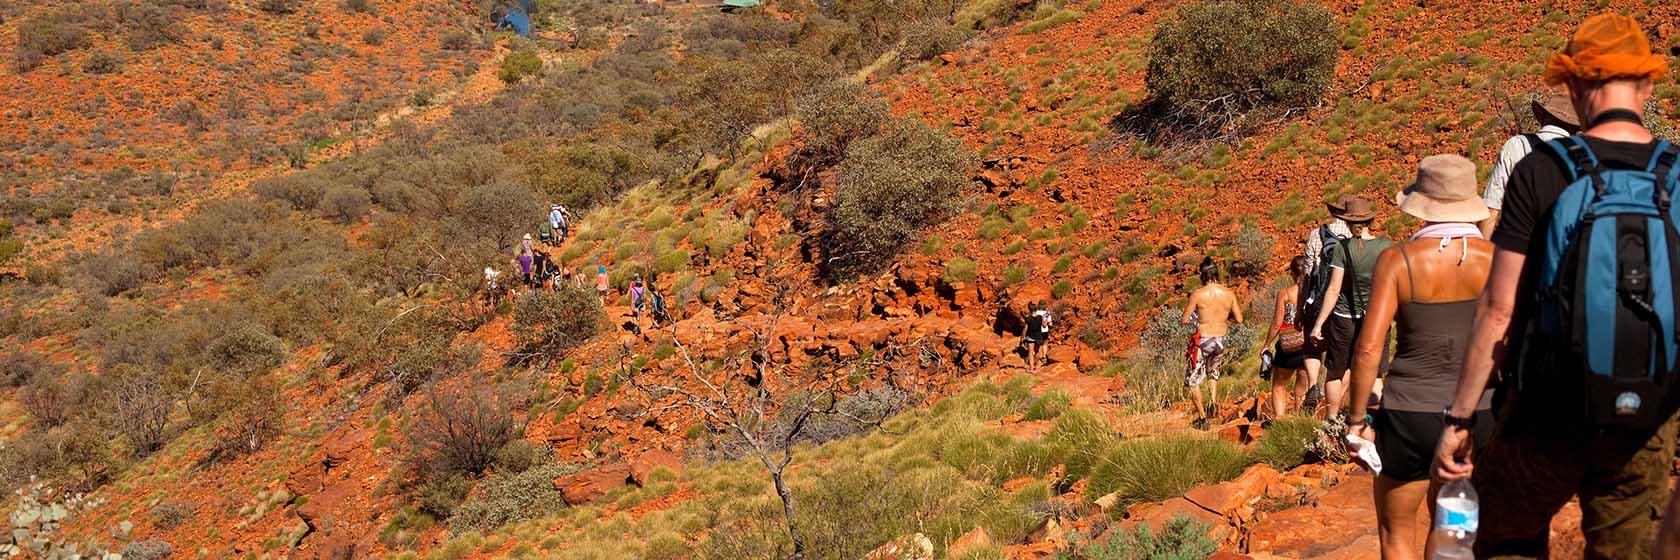 walking-safari-australias-red-centre